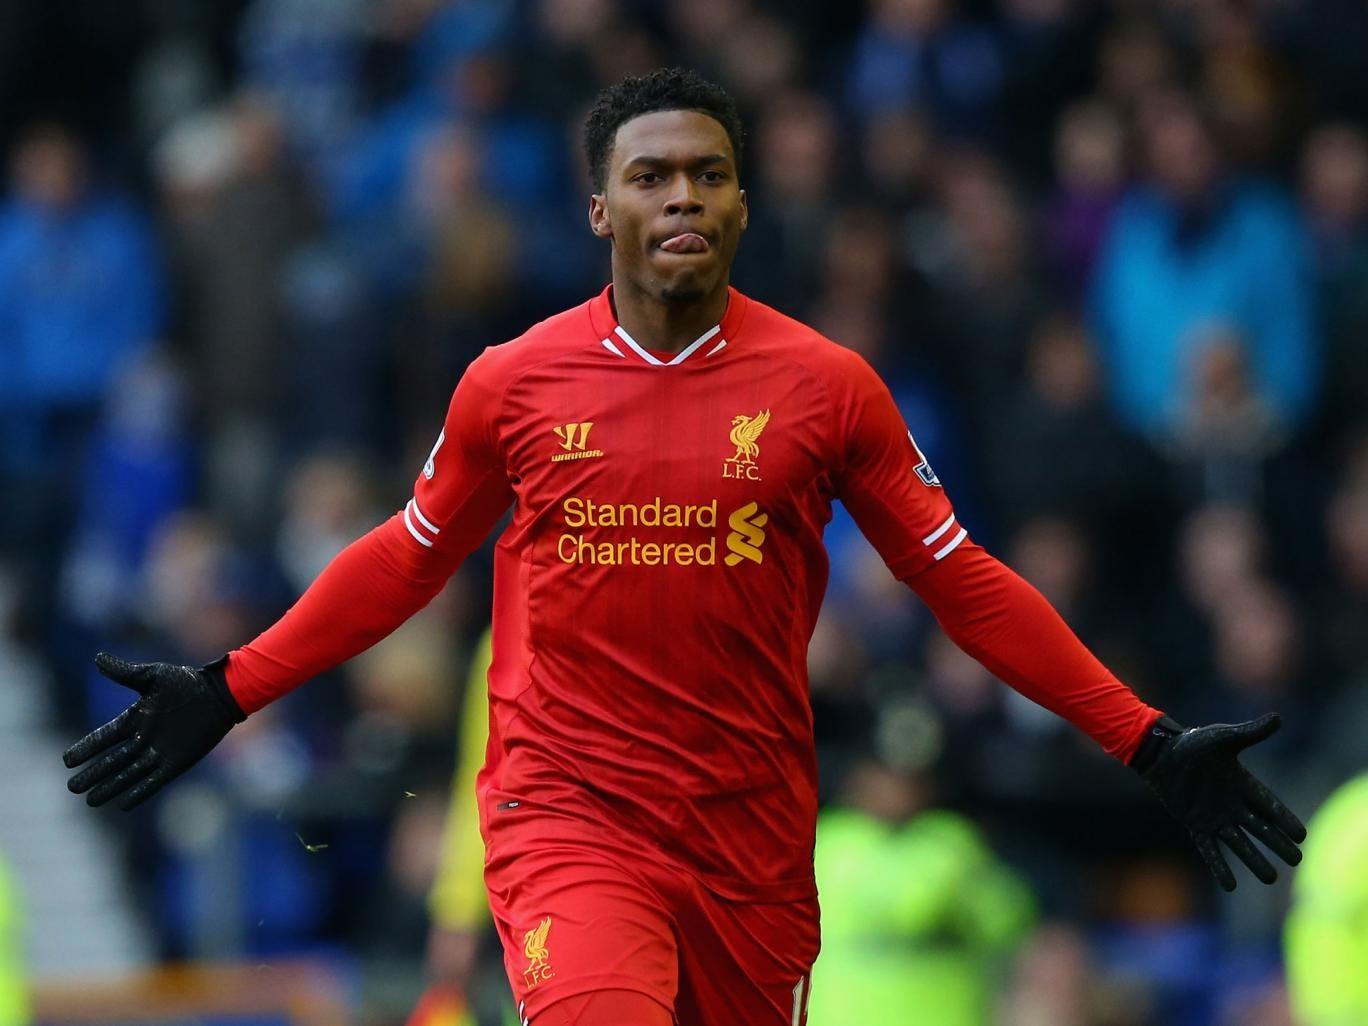 Daniel Sturridge celebrates after scoring an equaliser for Liverpool against Everton